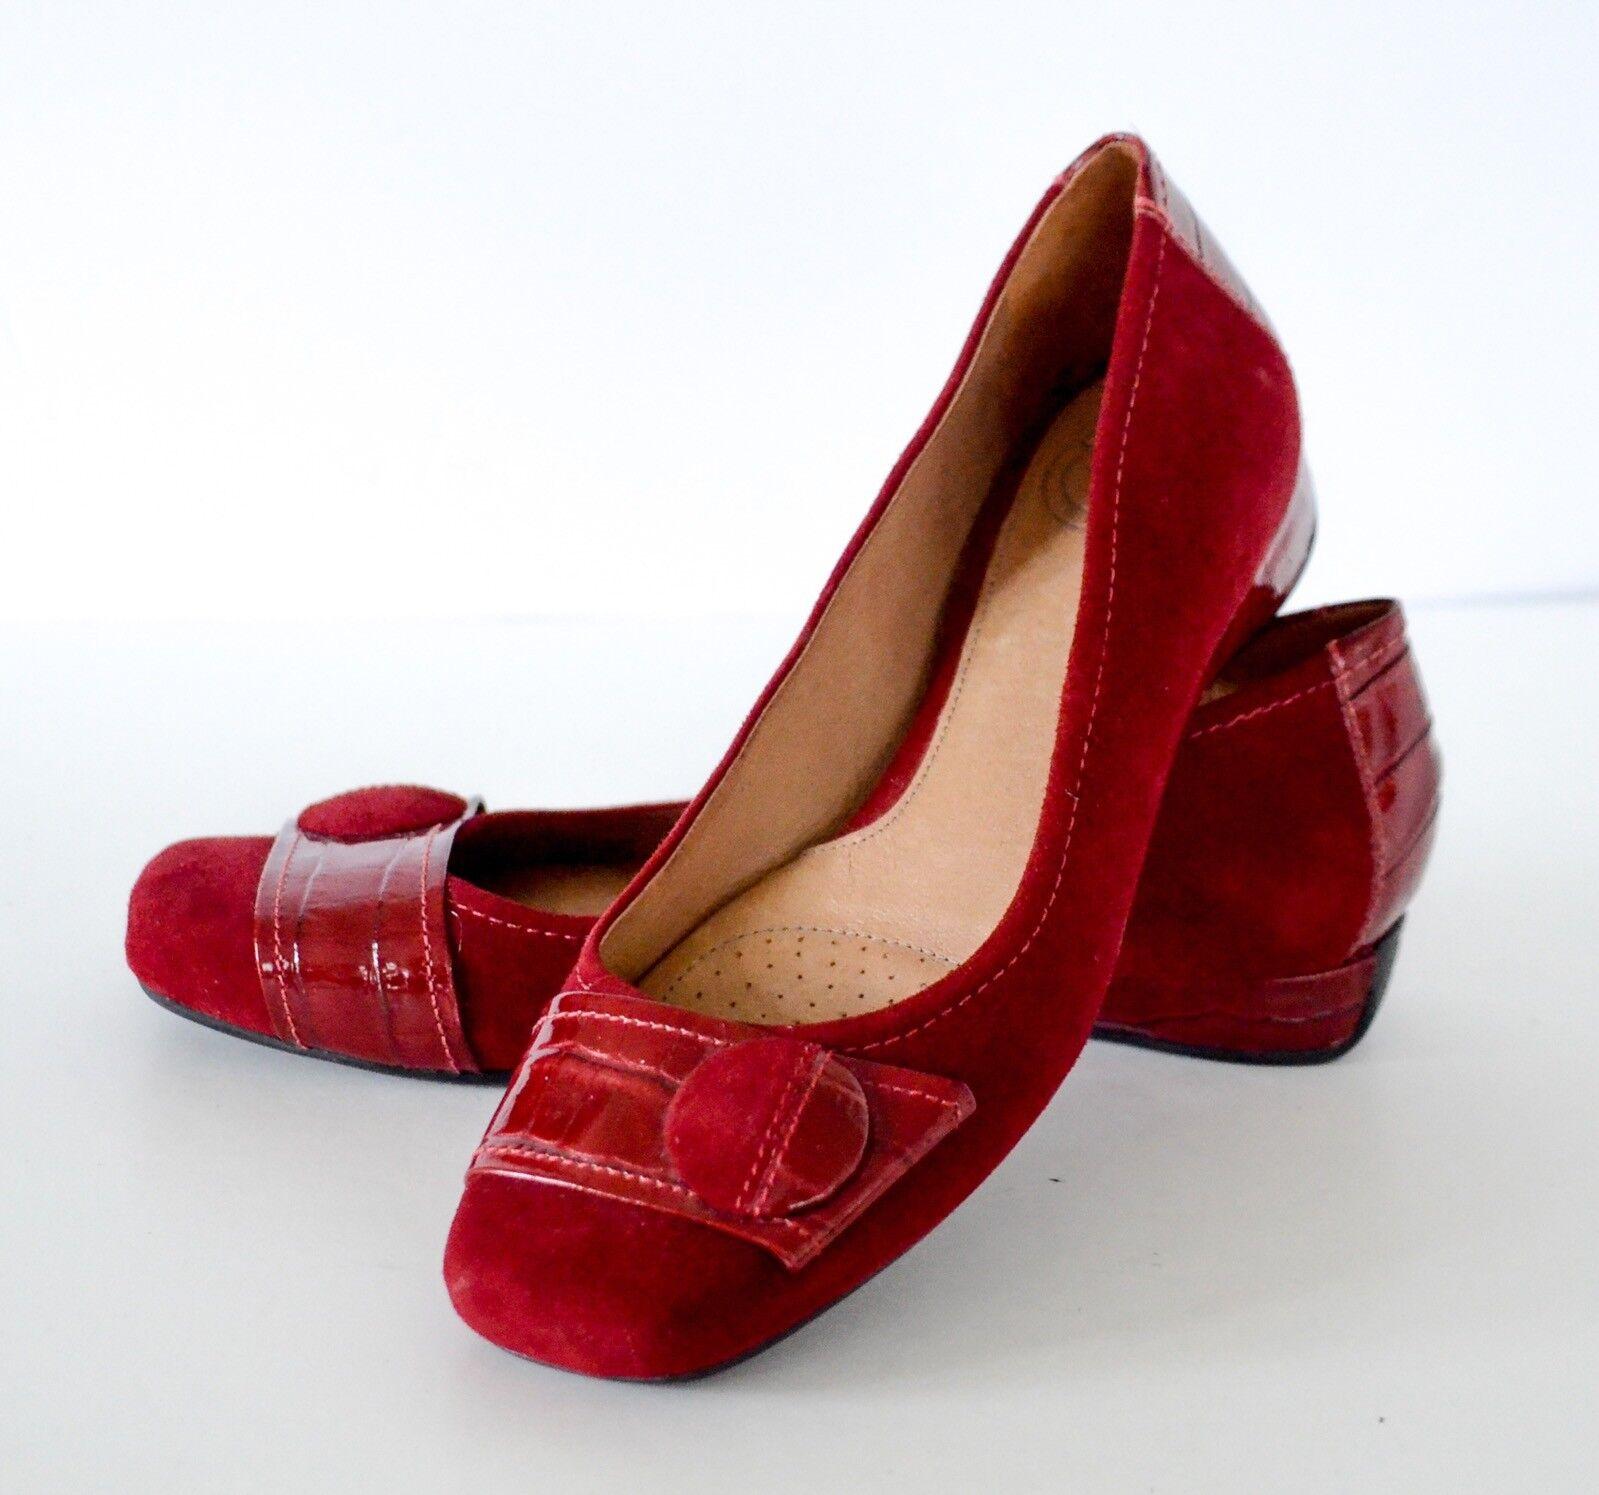 Nurture ROT Suede & Croc Print Patent Leder low heel Wedge Schuhes 8M